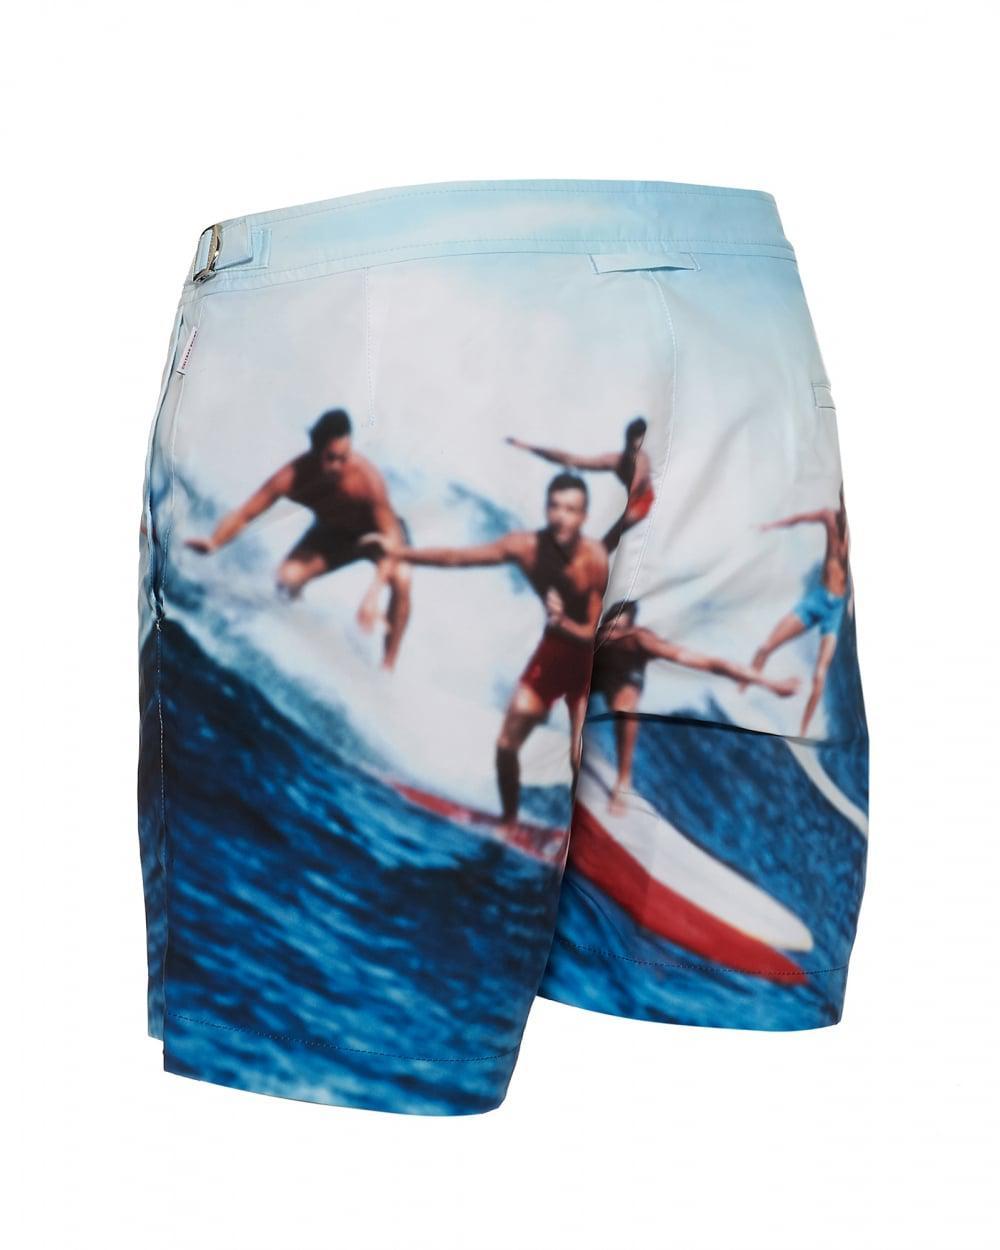 Clearance Choice Bulldog Swell Guys Swim Shorts - Blue Orlebar Brown Pre Order Online sA3srCPWGr